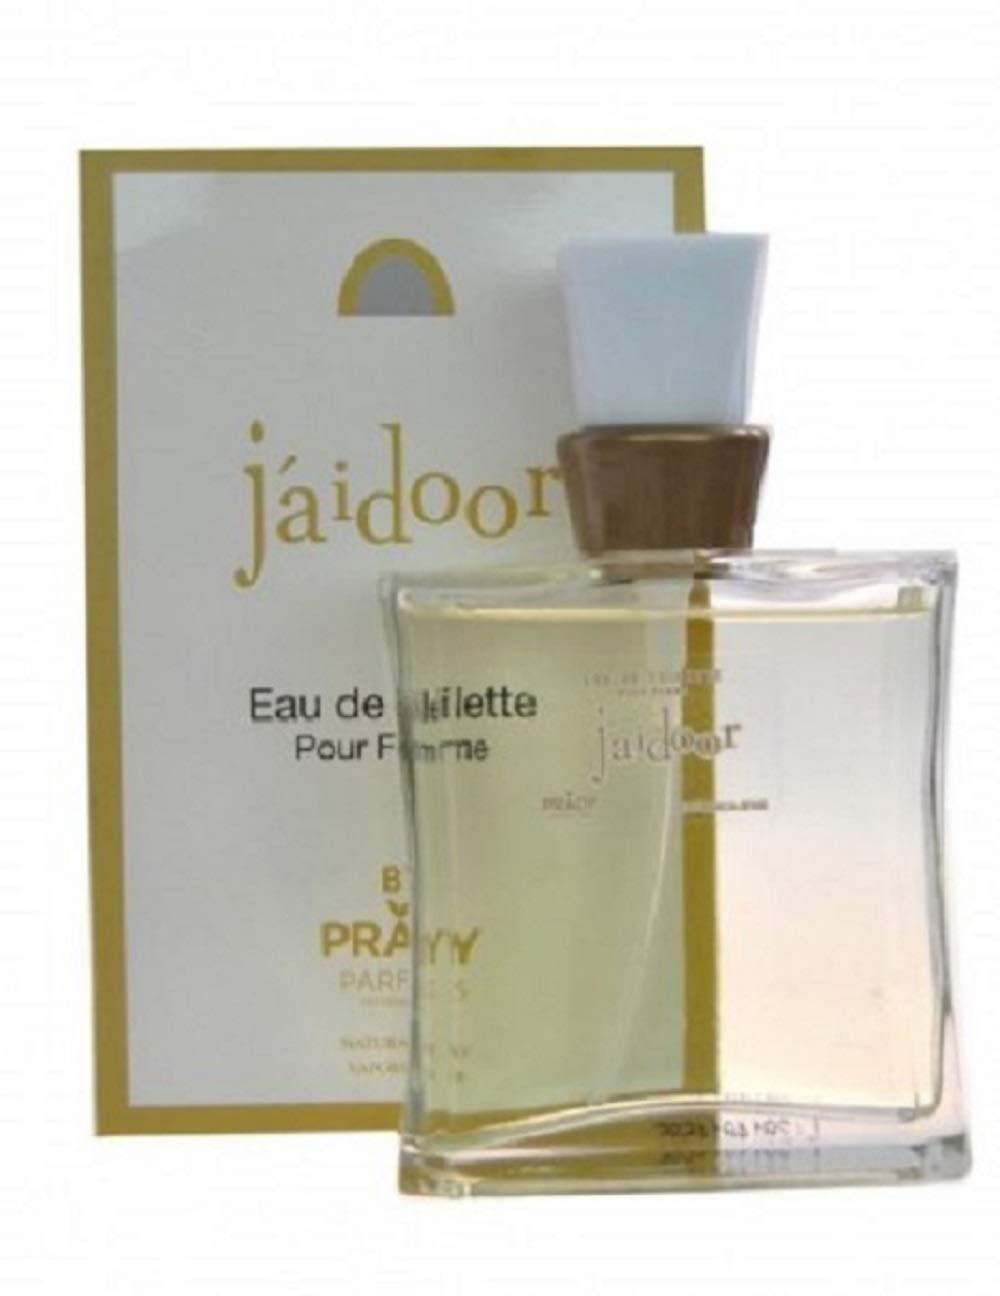 JAidor-Perfume para mujer Générique gran marca Eau De Toilette 100 ml: Amazon.es: Belleza